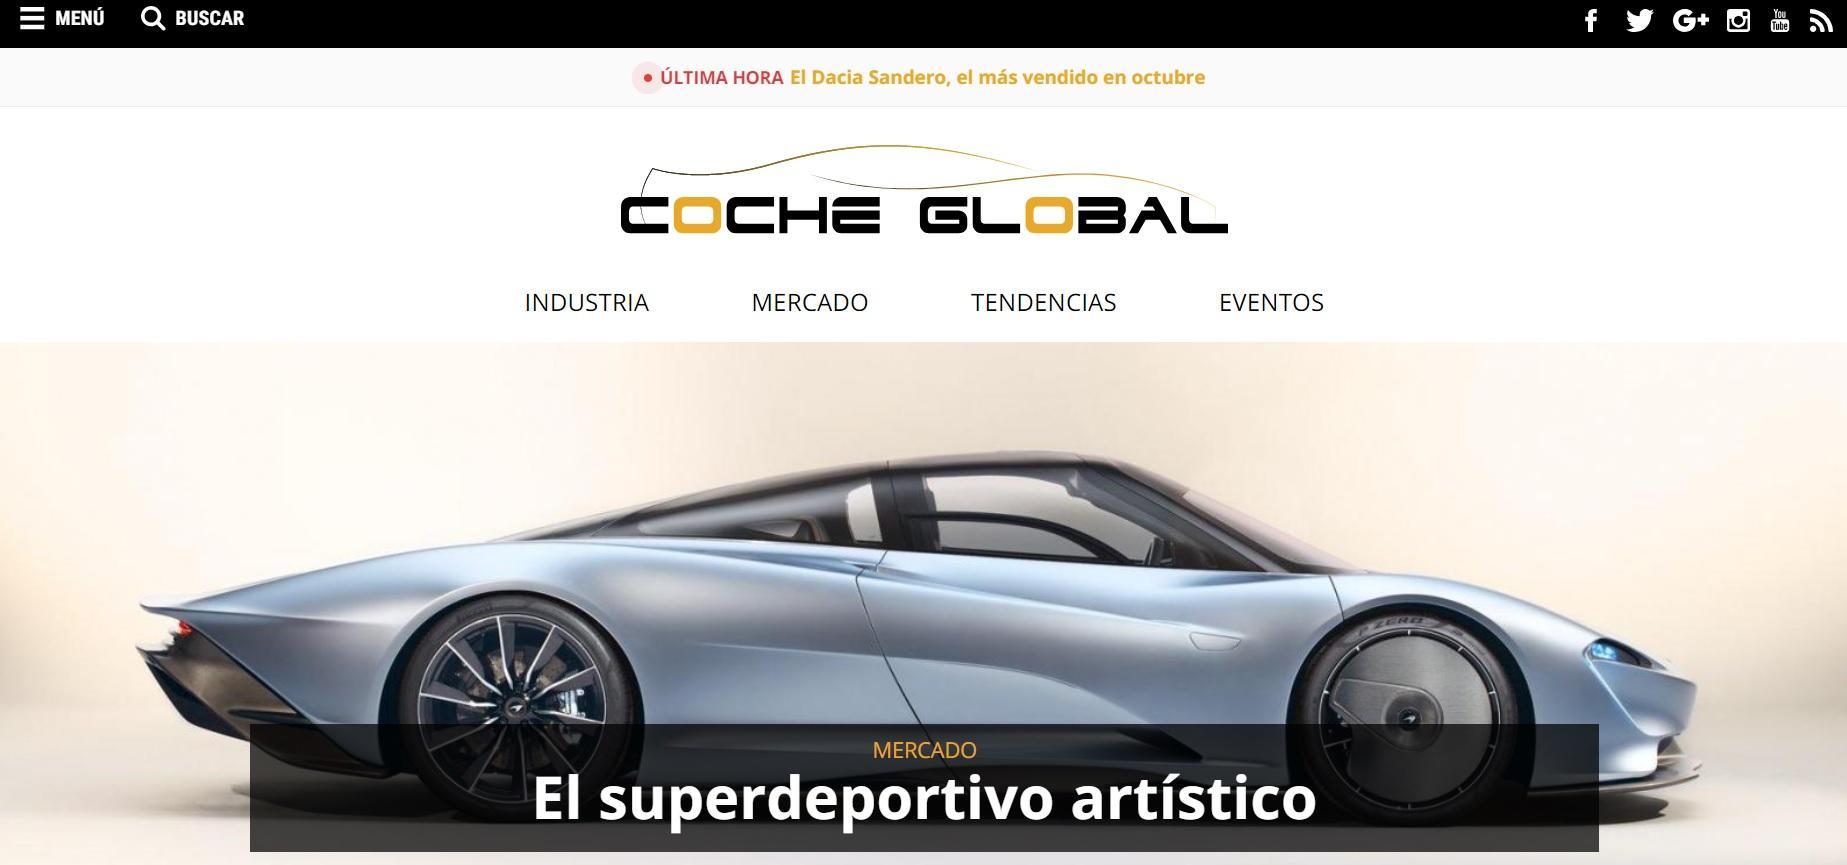 Movilidad y Automóvil Coche Global - Magazine cover